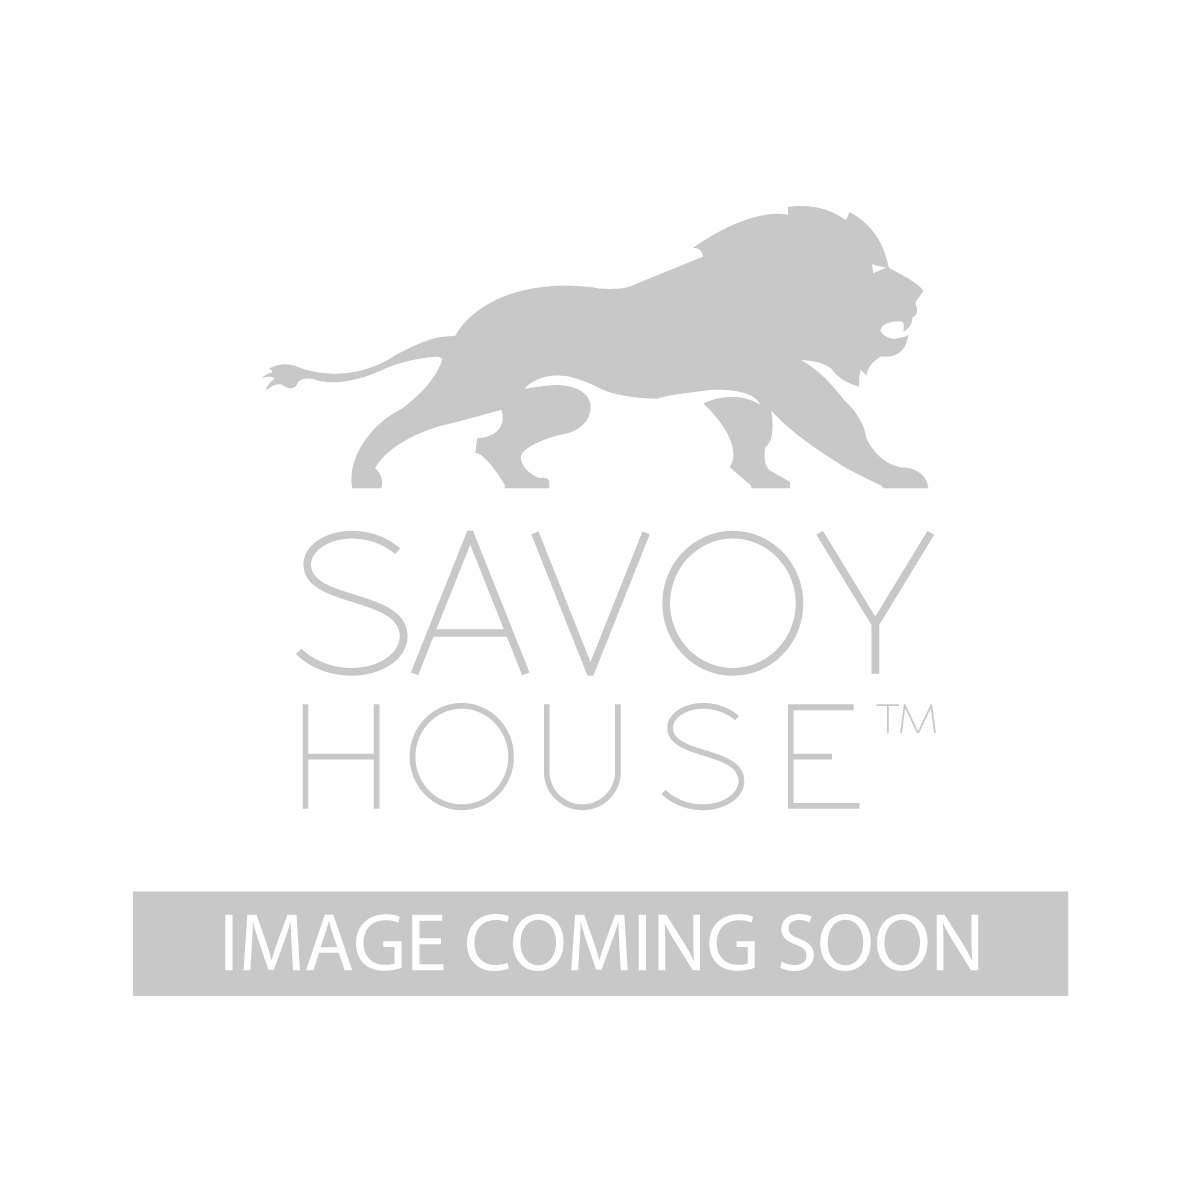 1 8075 3 13 Scout 3 Light Semi Flush By Savoy House